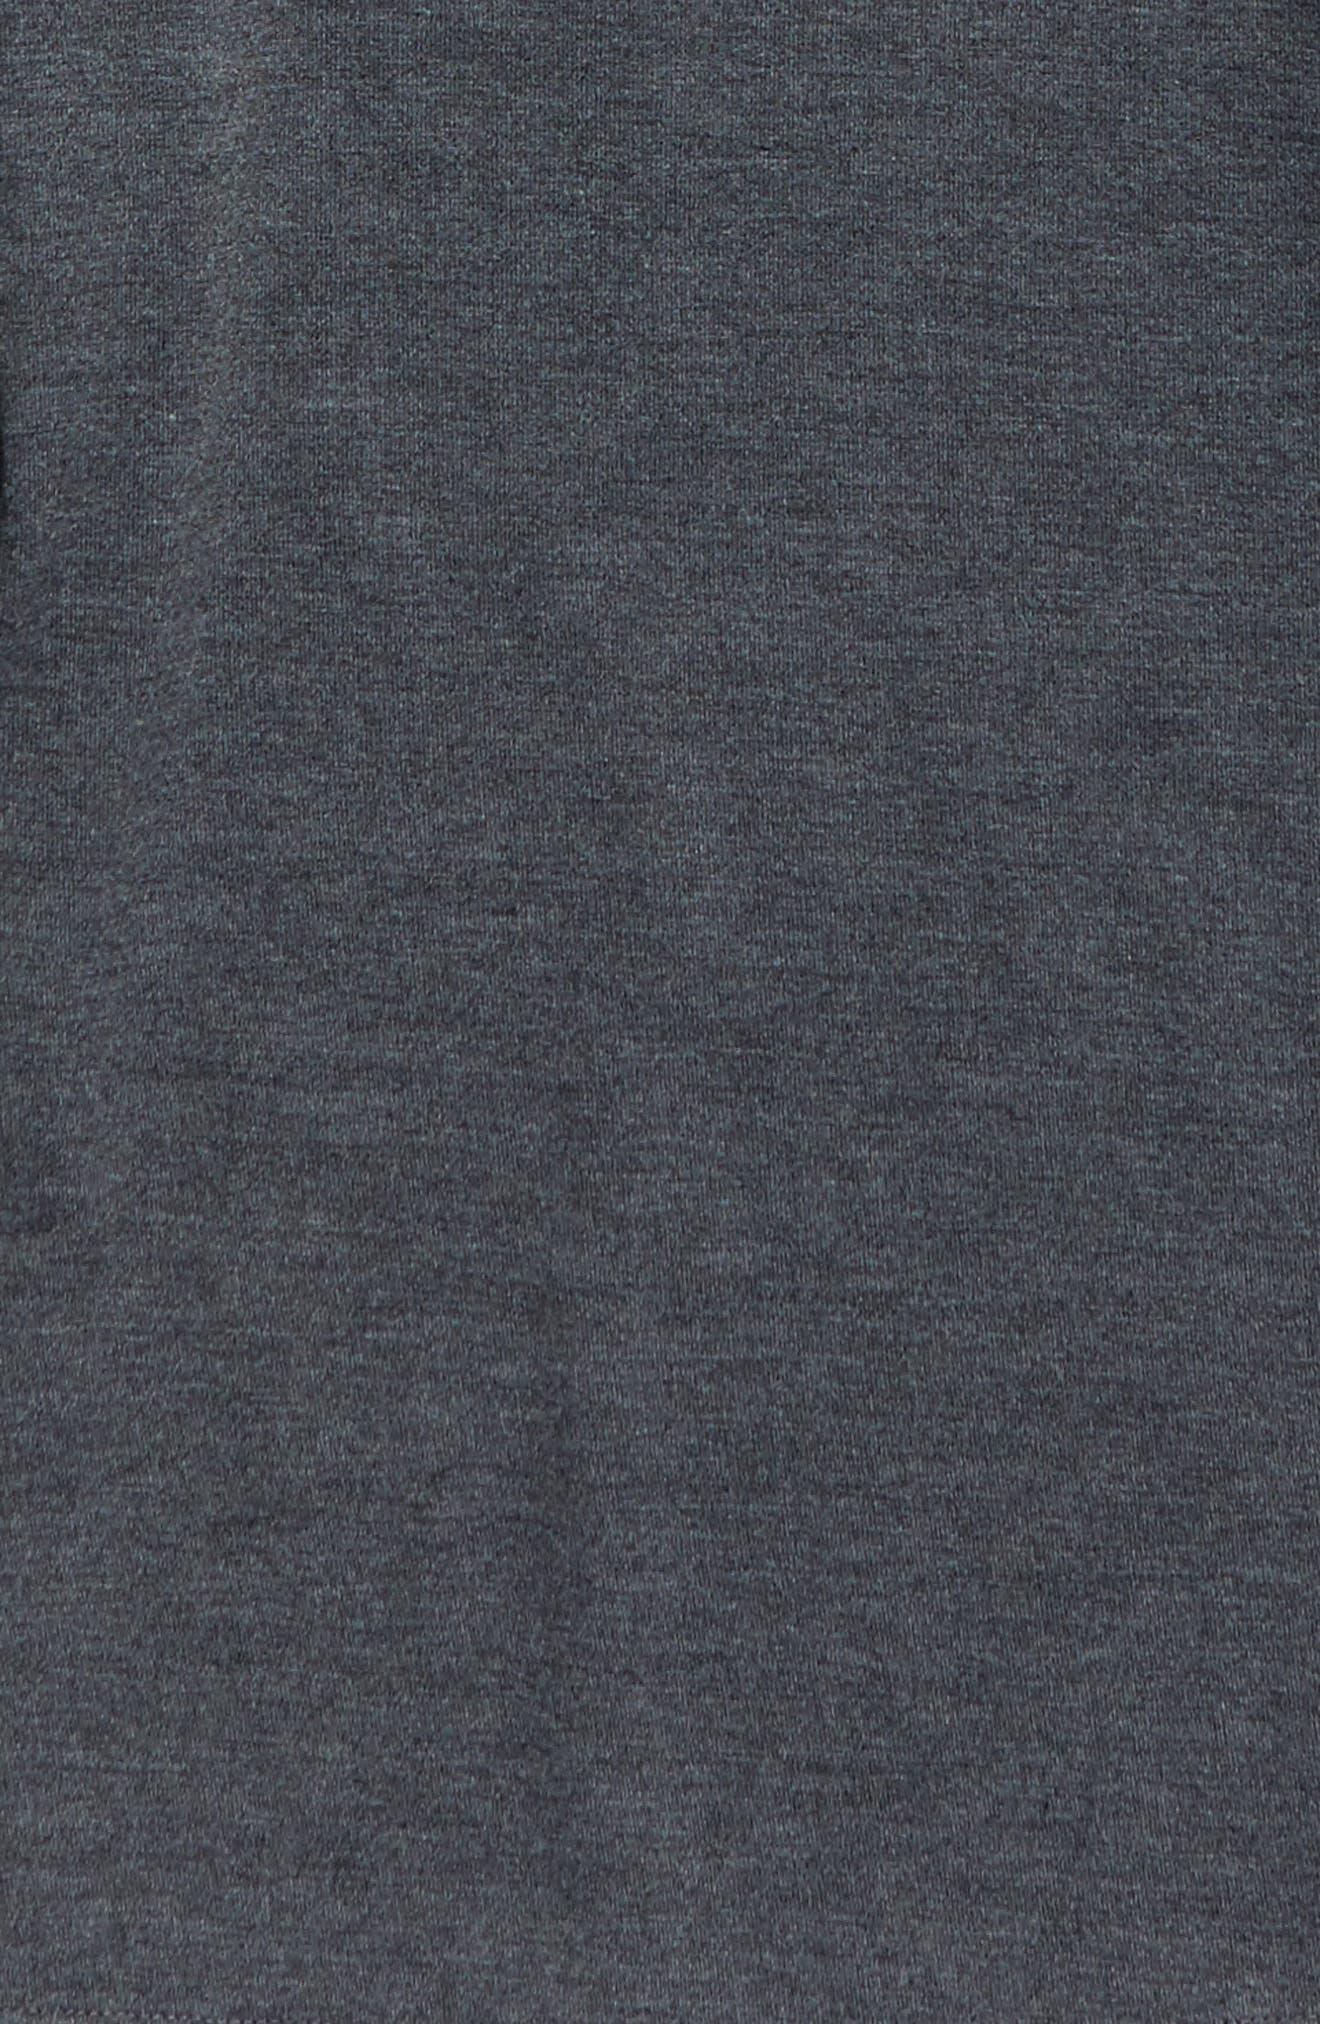 Ruffle Sleeve Sweatshirt,                             Alternate thumbnail 2, color,                             023